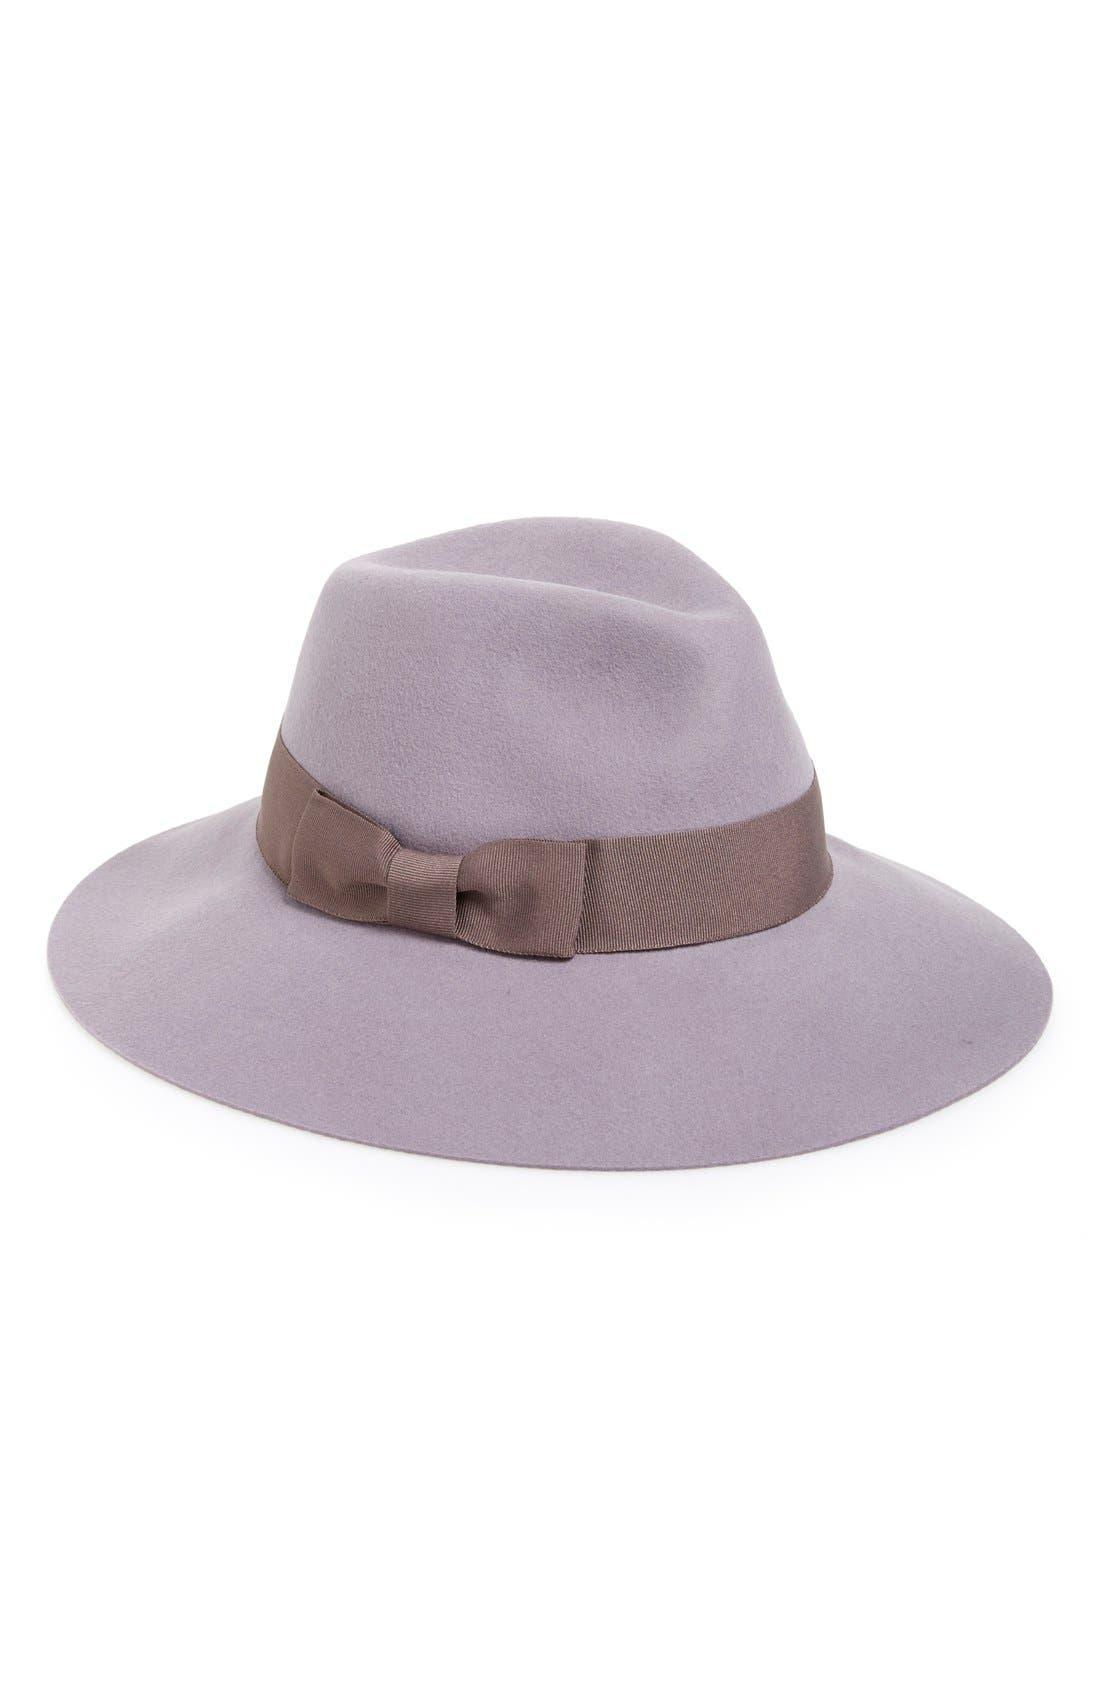 Alternate Image 1 Selected - August Hat Pastel Wool Fedora